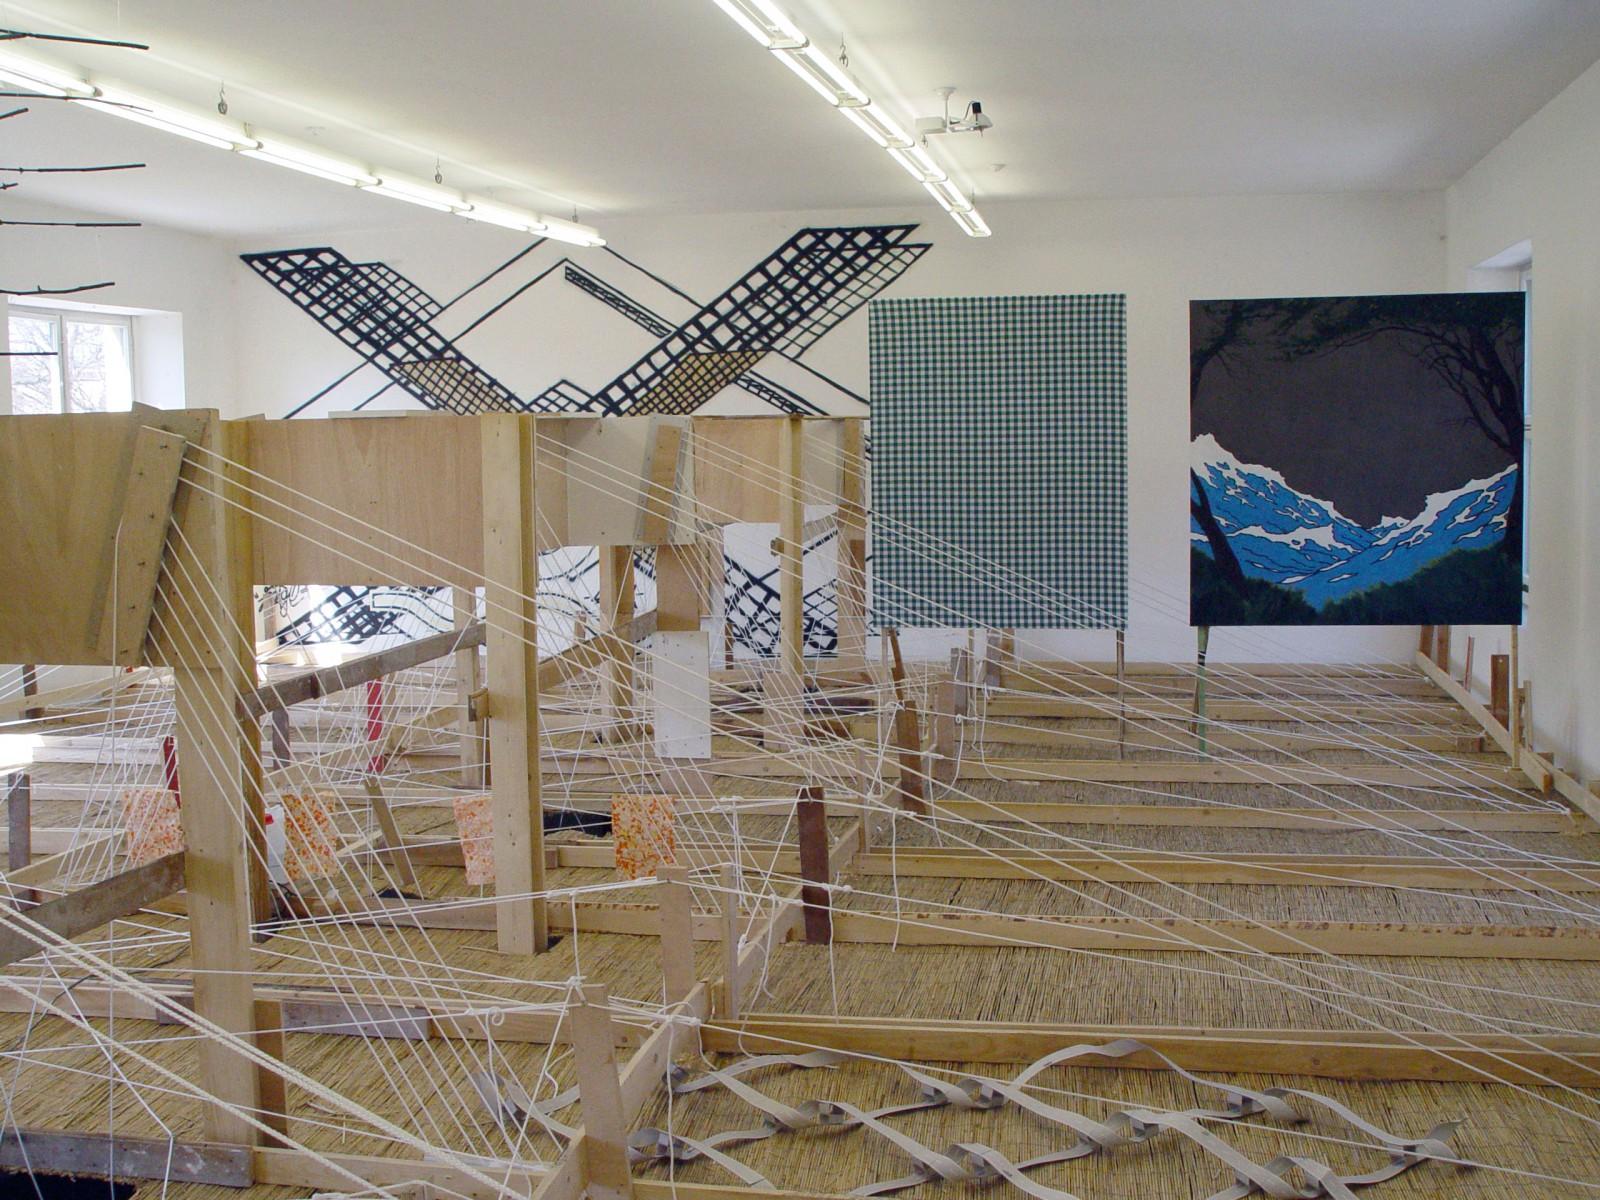 Kim Nekarda: The state of the upper floor, Panorama, 2003, Kunstverein München, Michael Beutler, Thomas Kratz, Michael Krebber